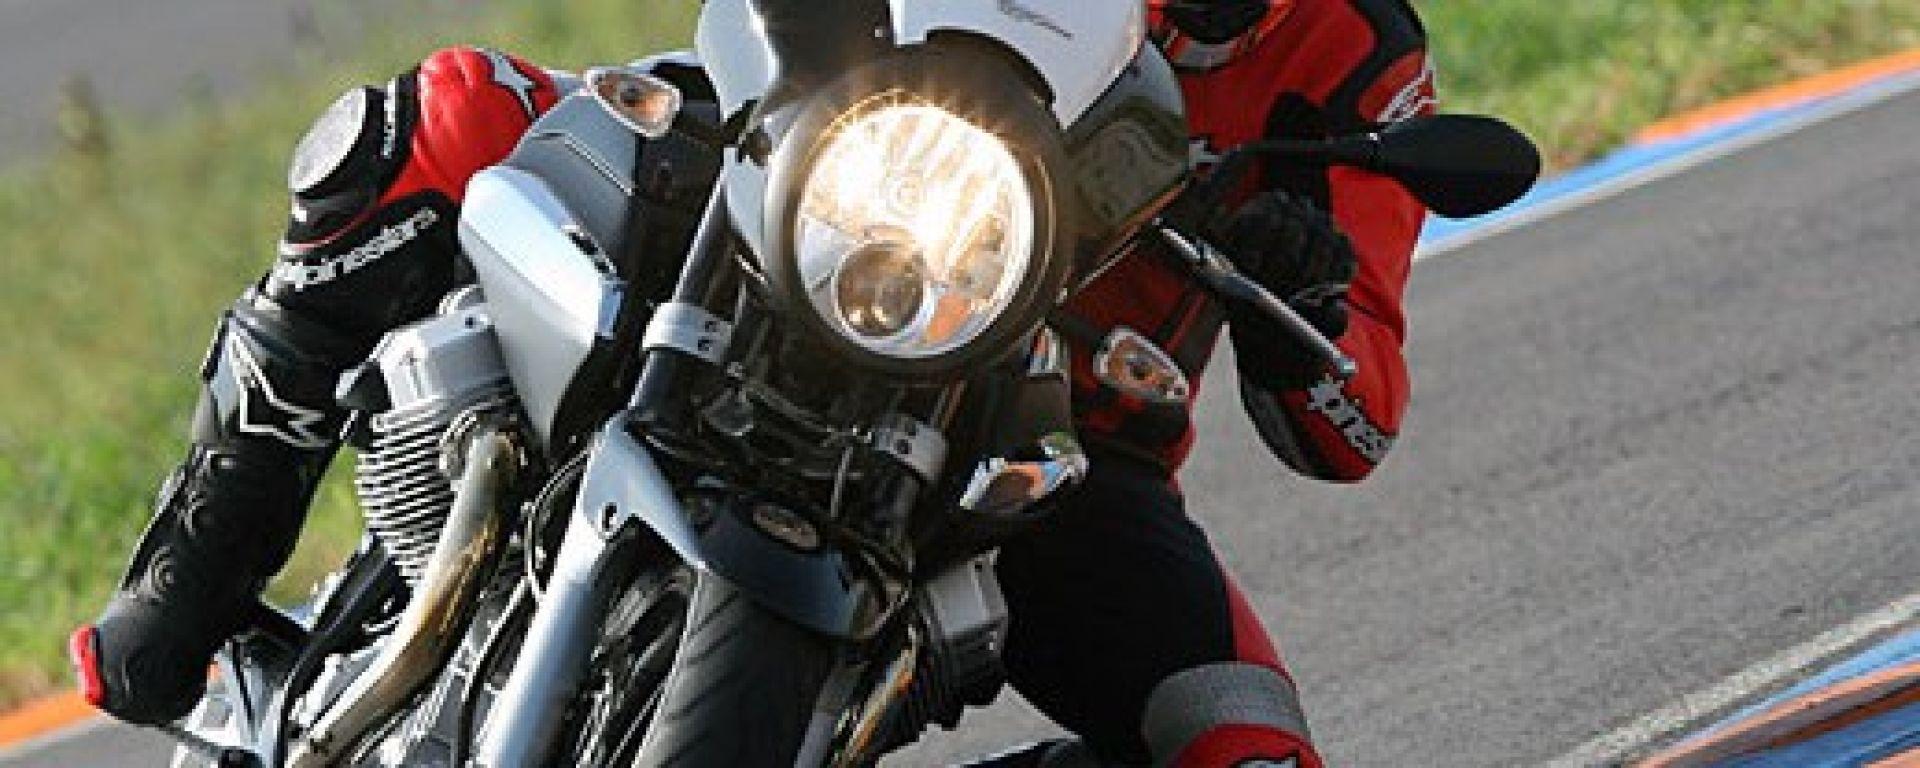 prova: moto guzzi 1200 sport - motorbox